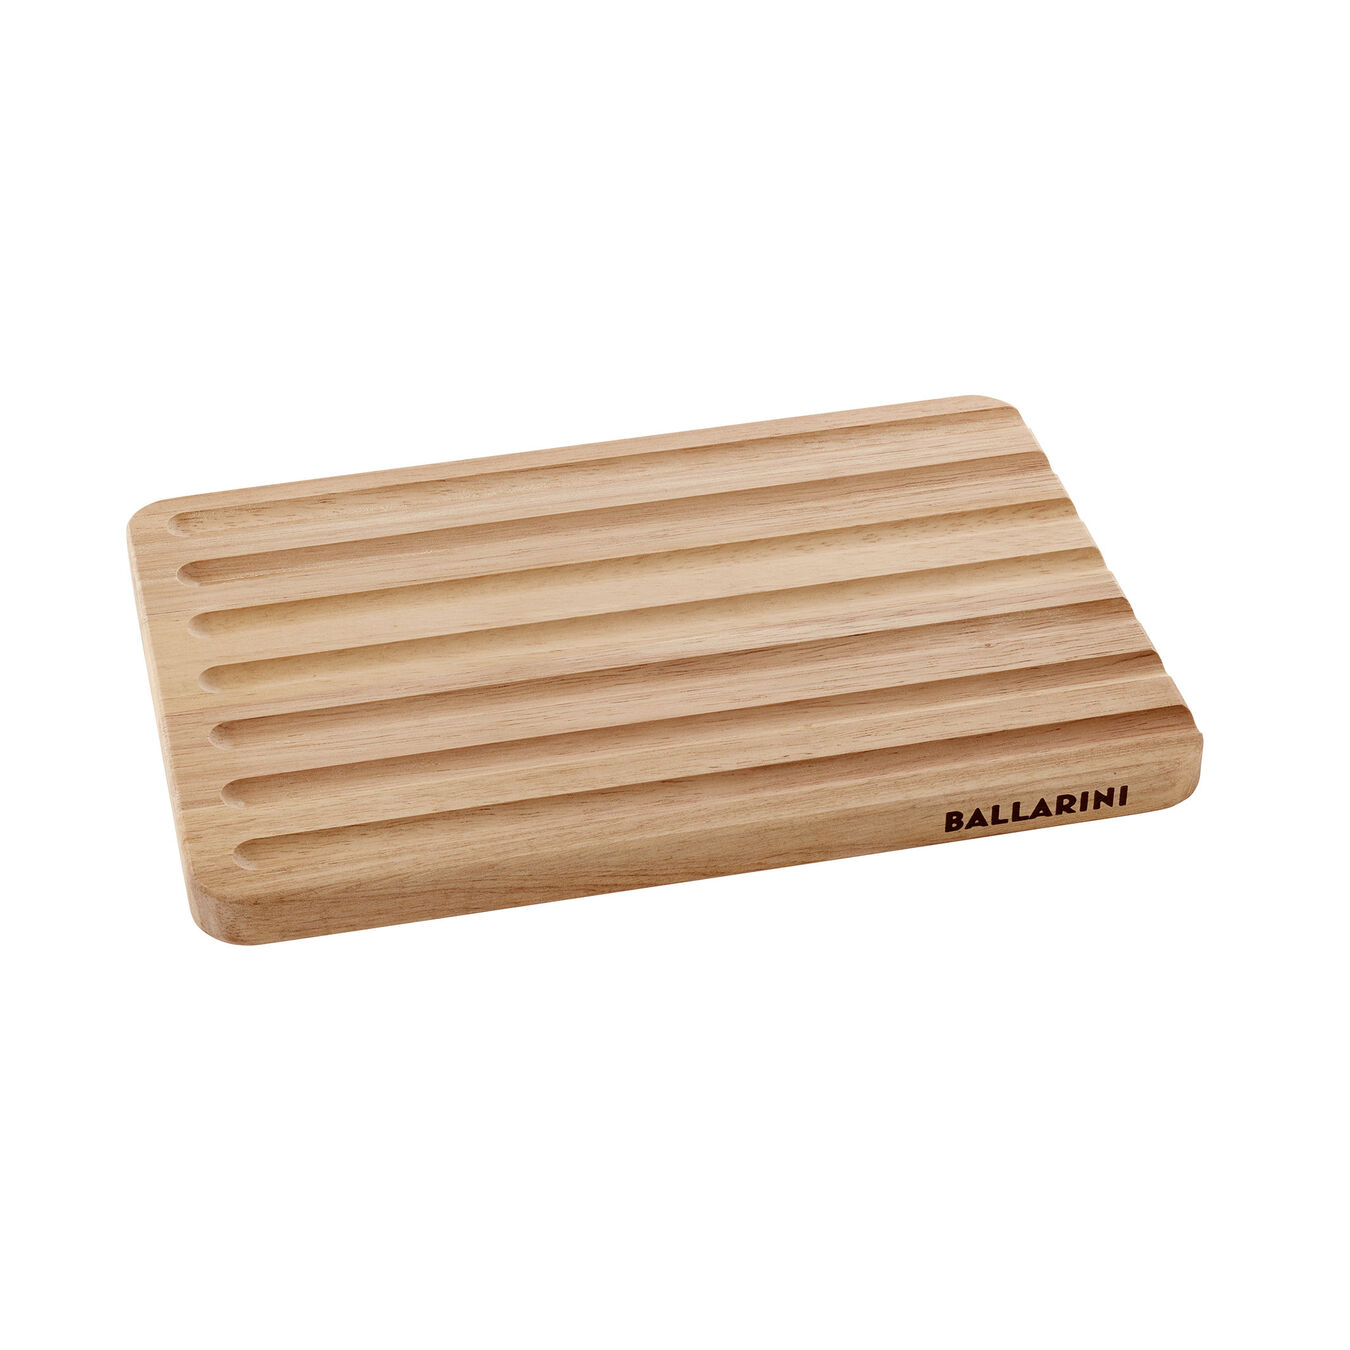 Cutting board 32 cm x 22 cm rubberwood,,large 2